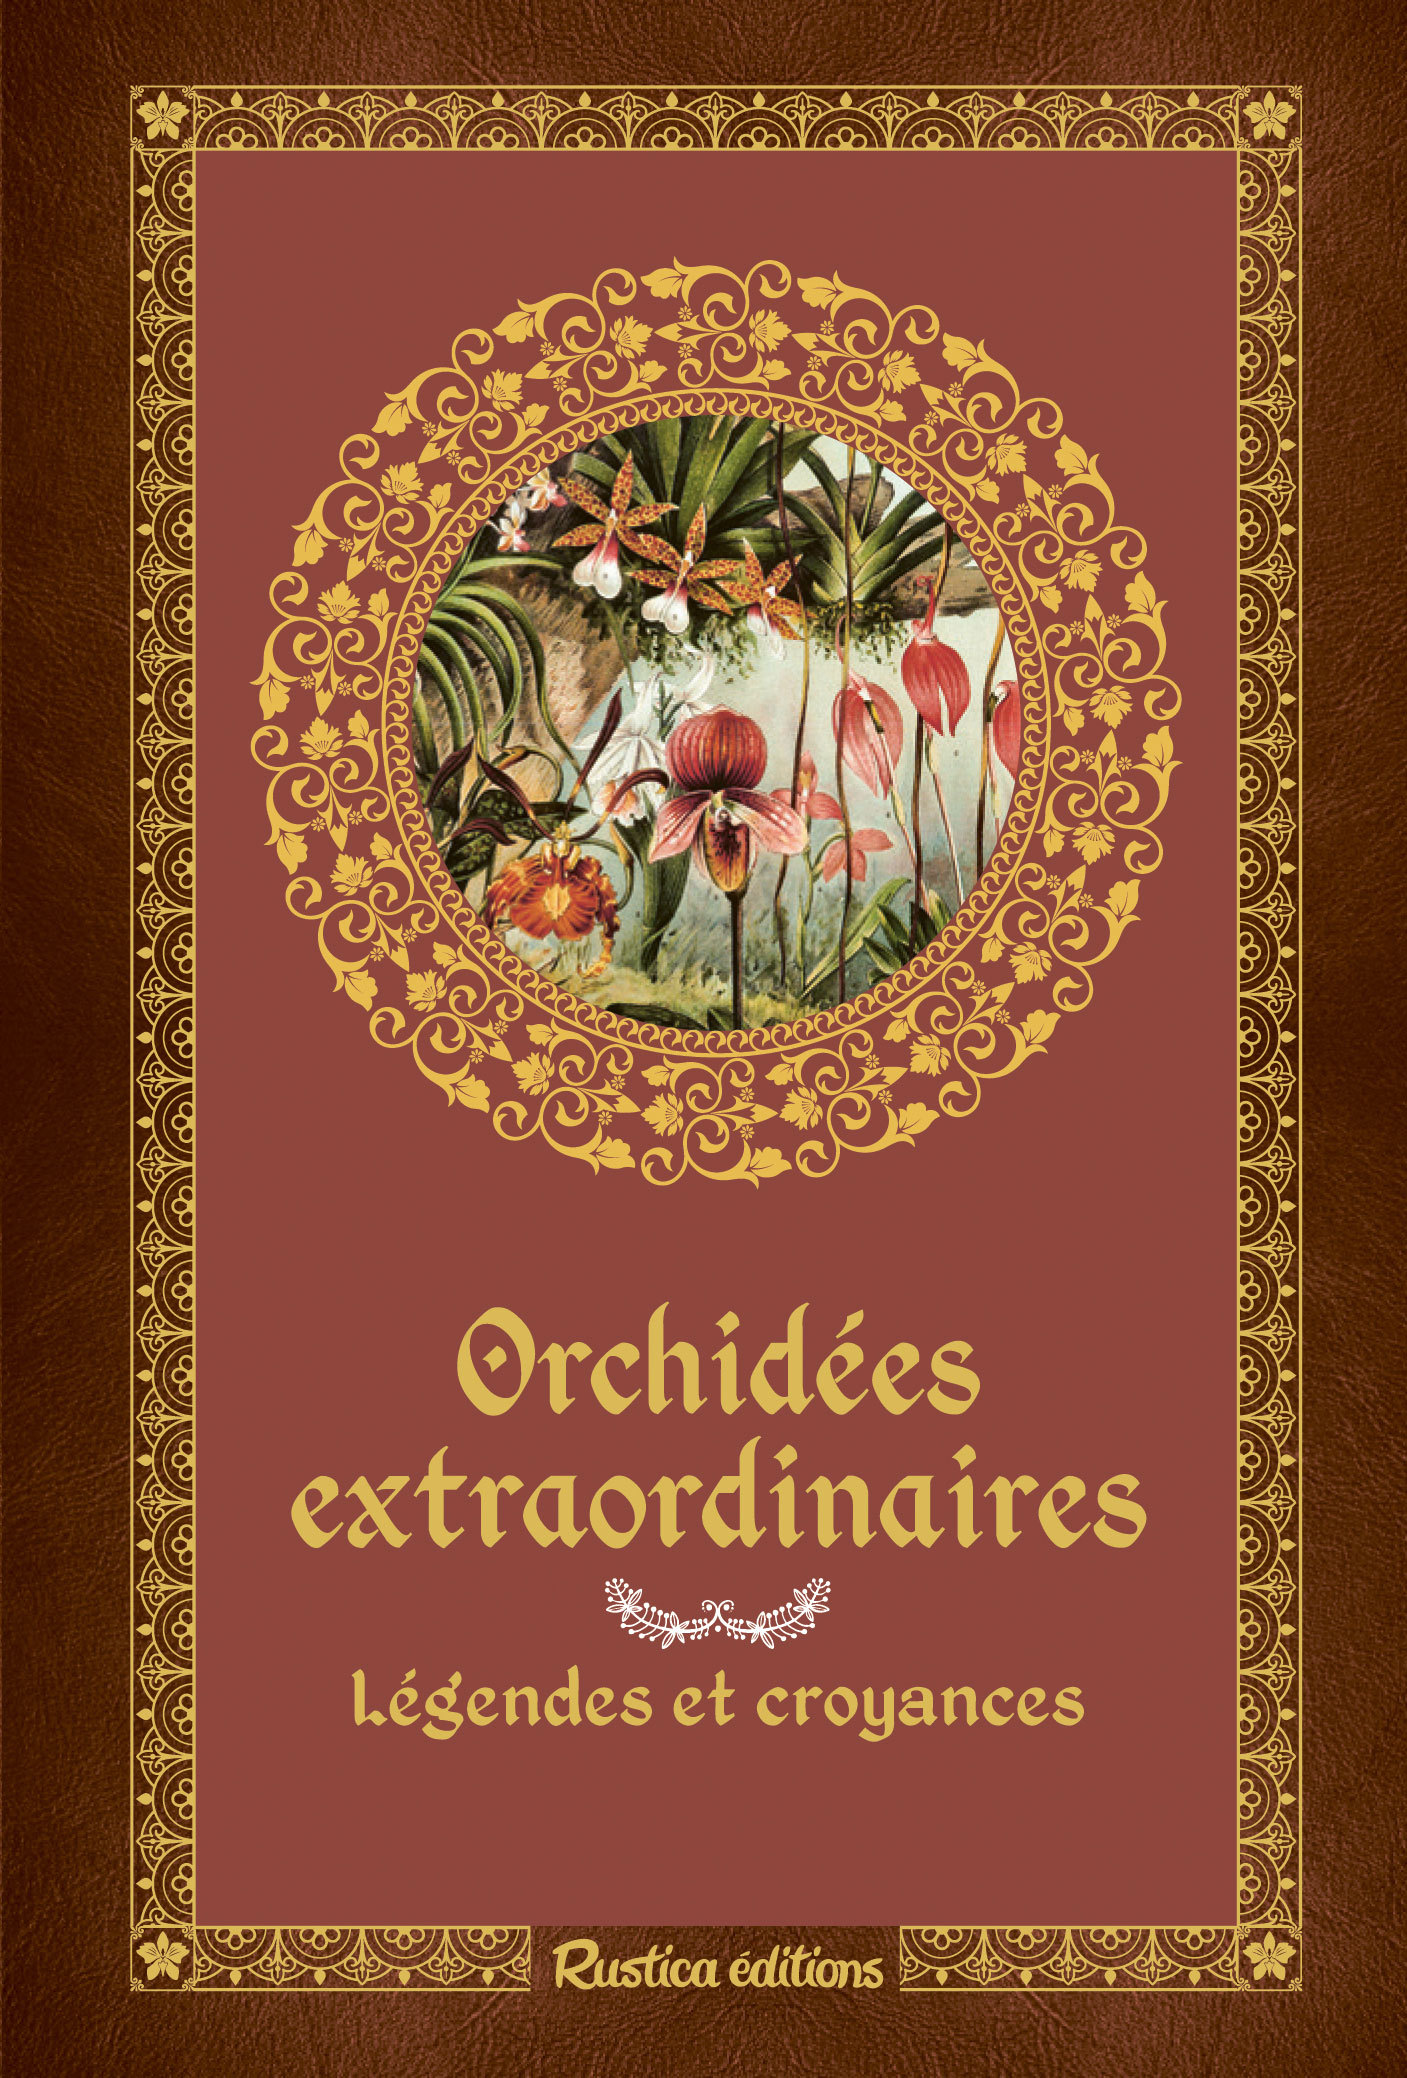 ORCHIDEES EXTRAORDINAIRES